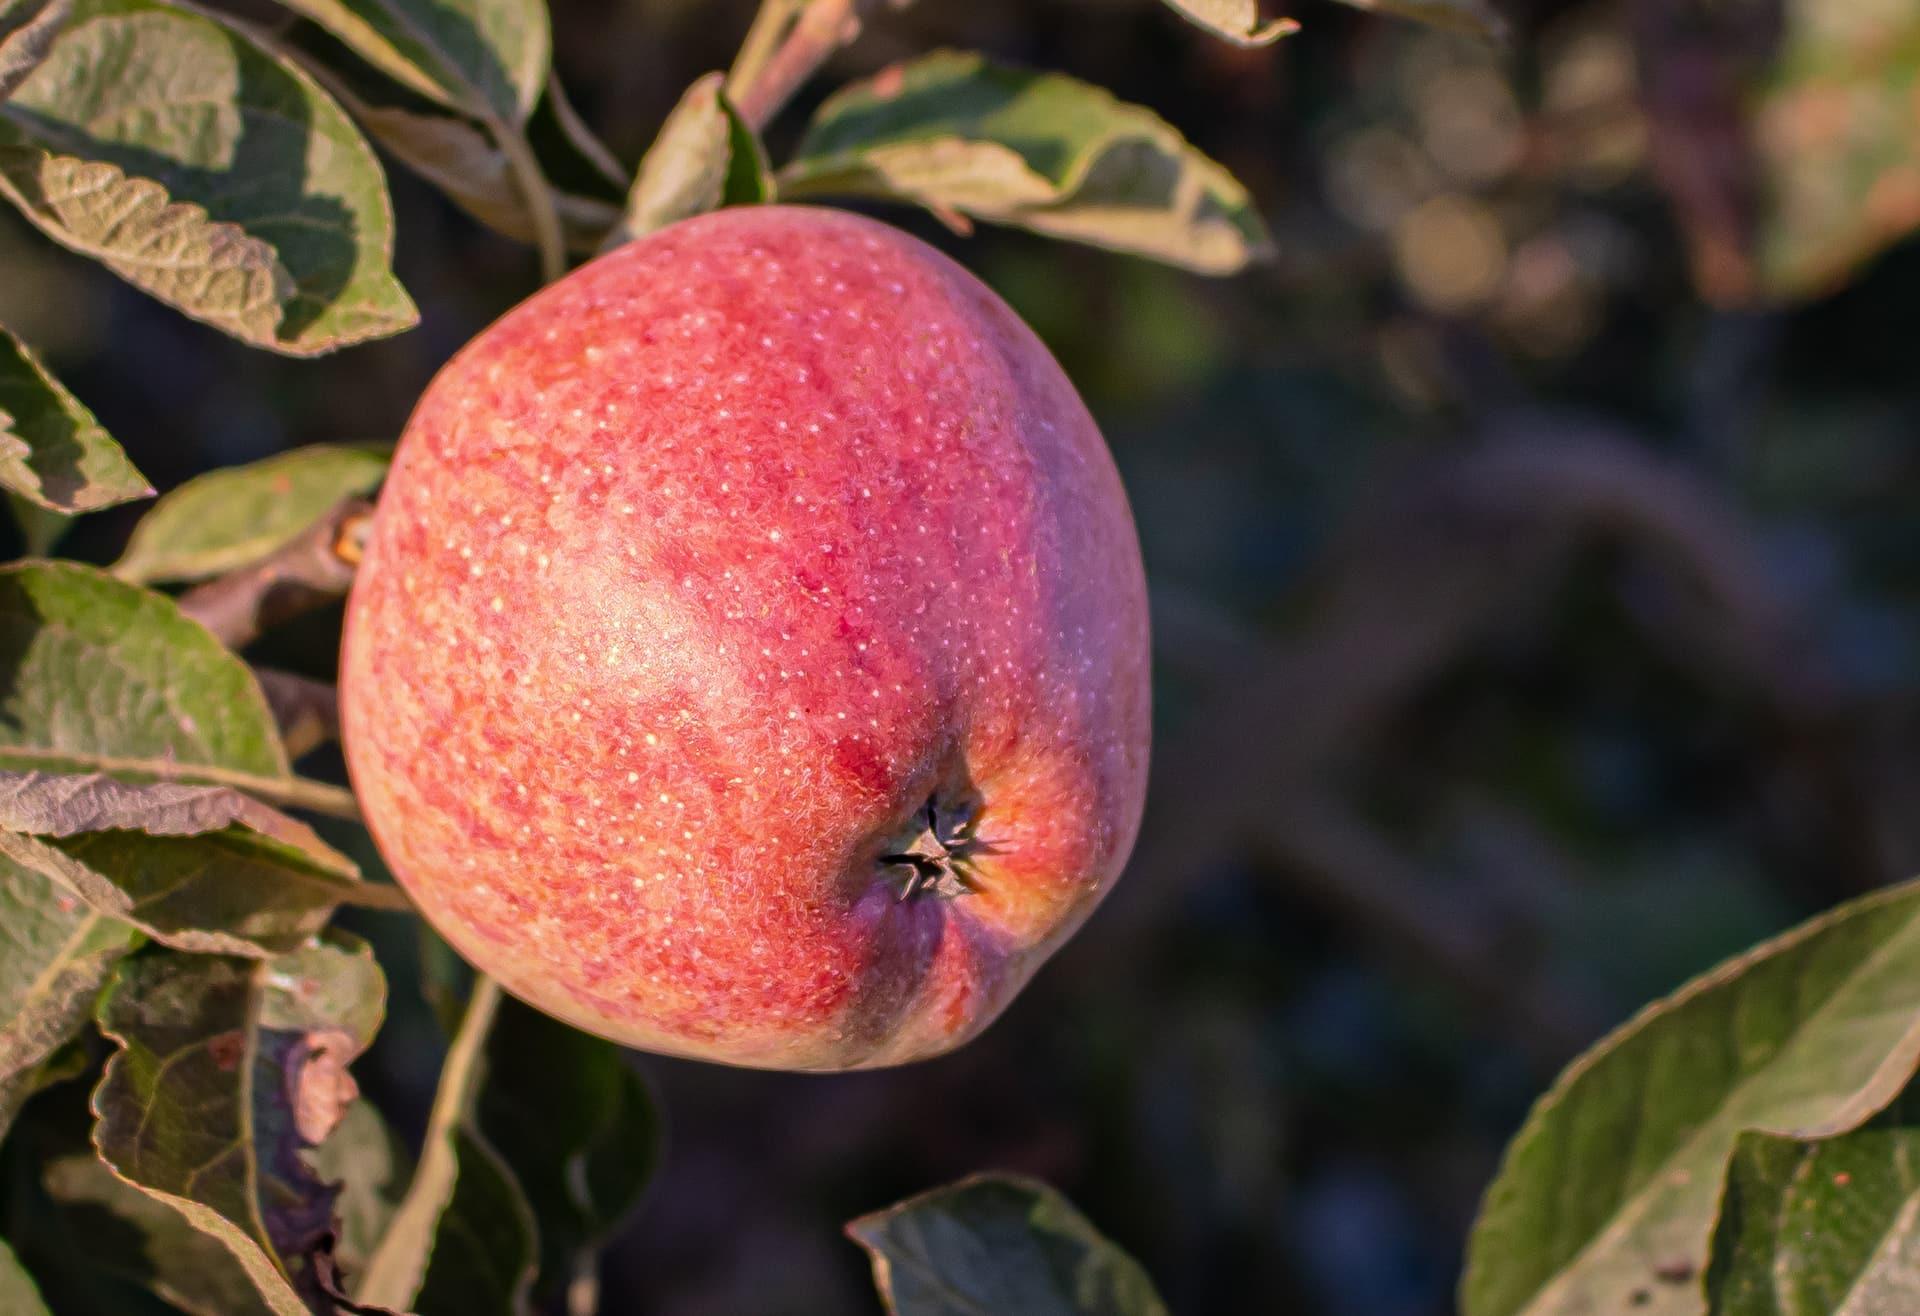 Manzanas para la sidra Carral: Starkin